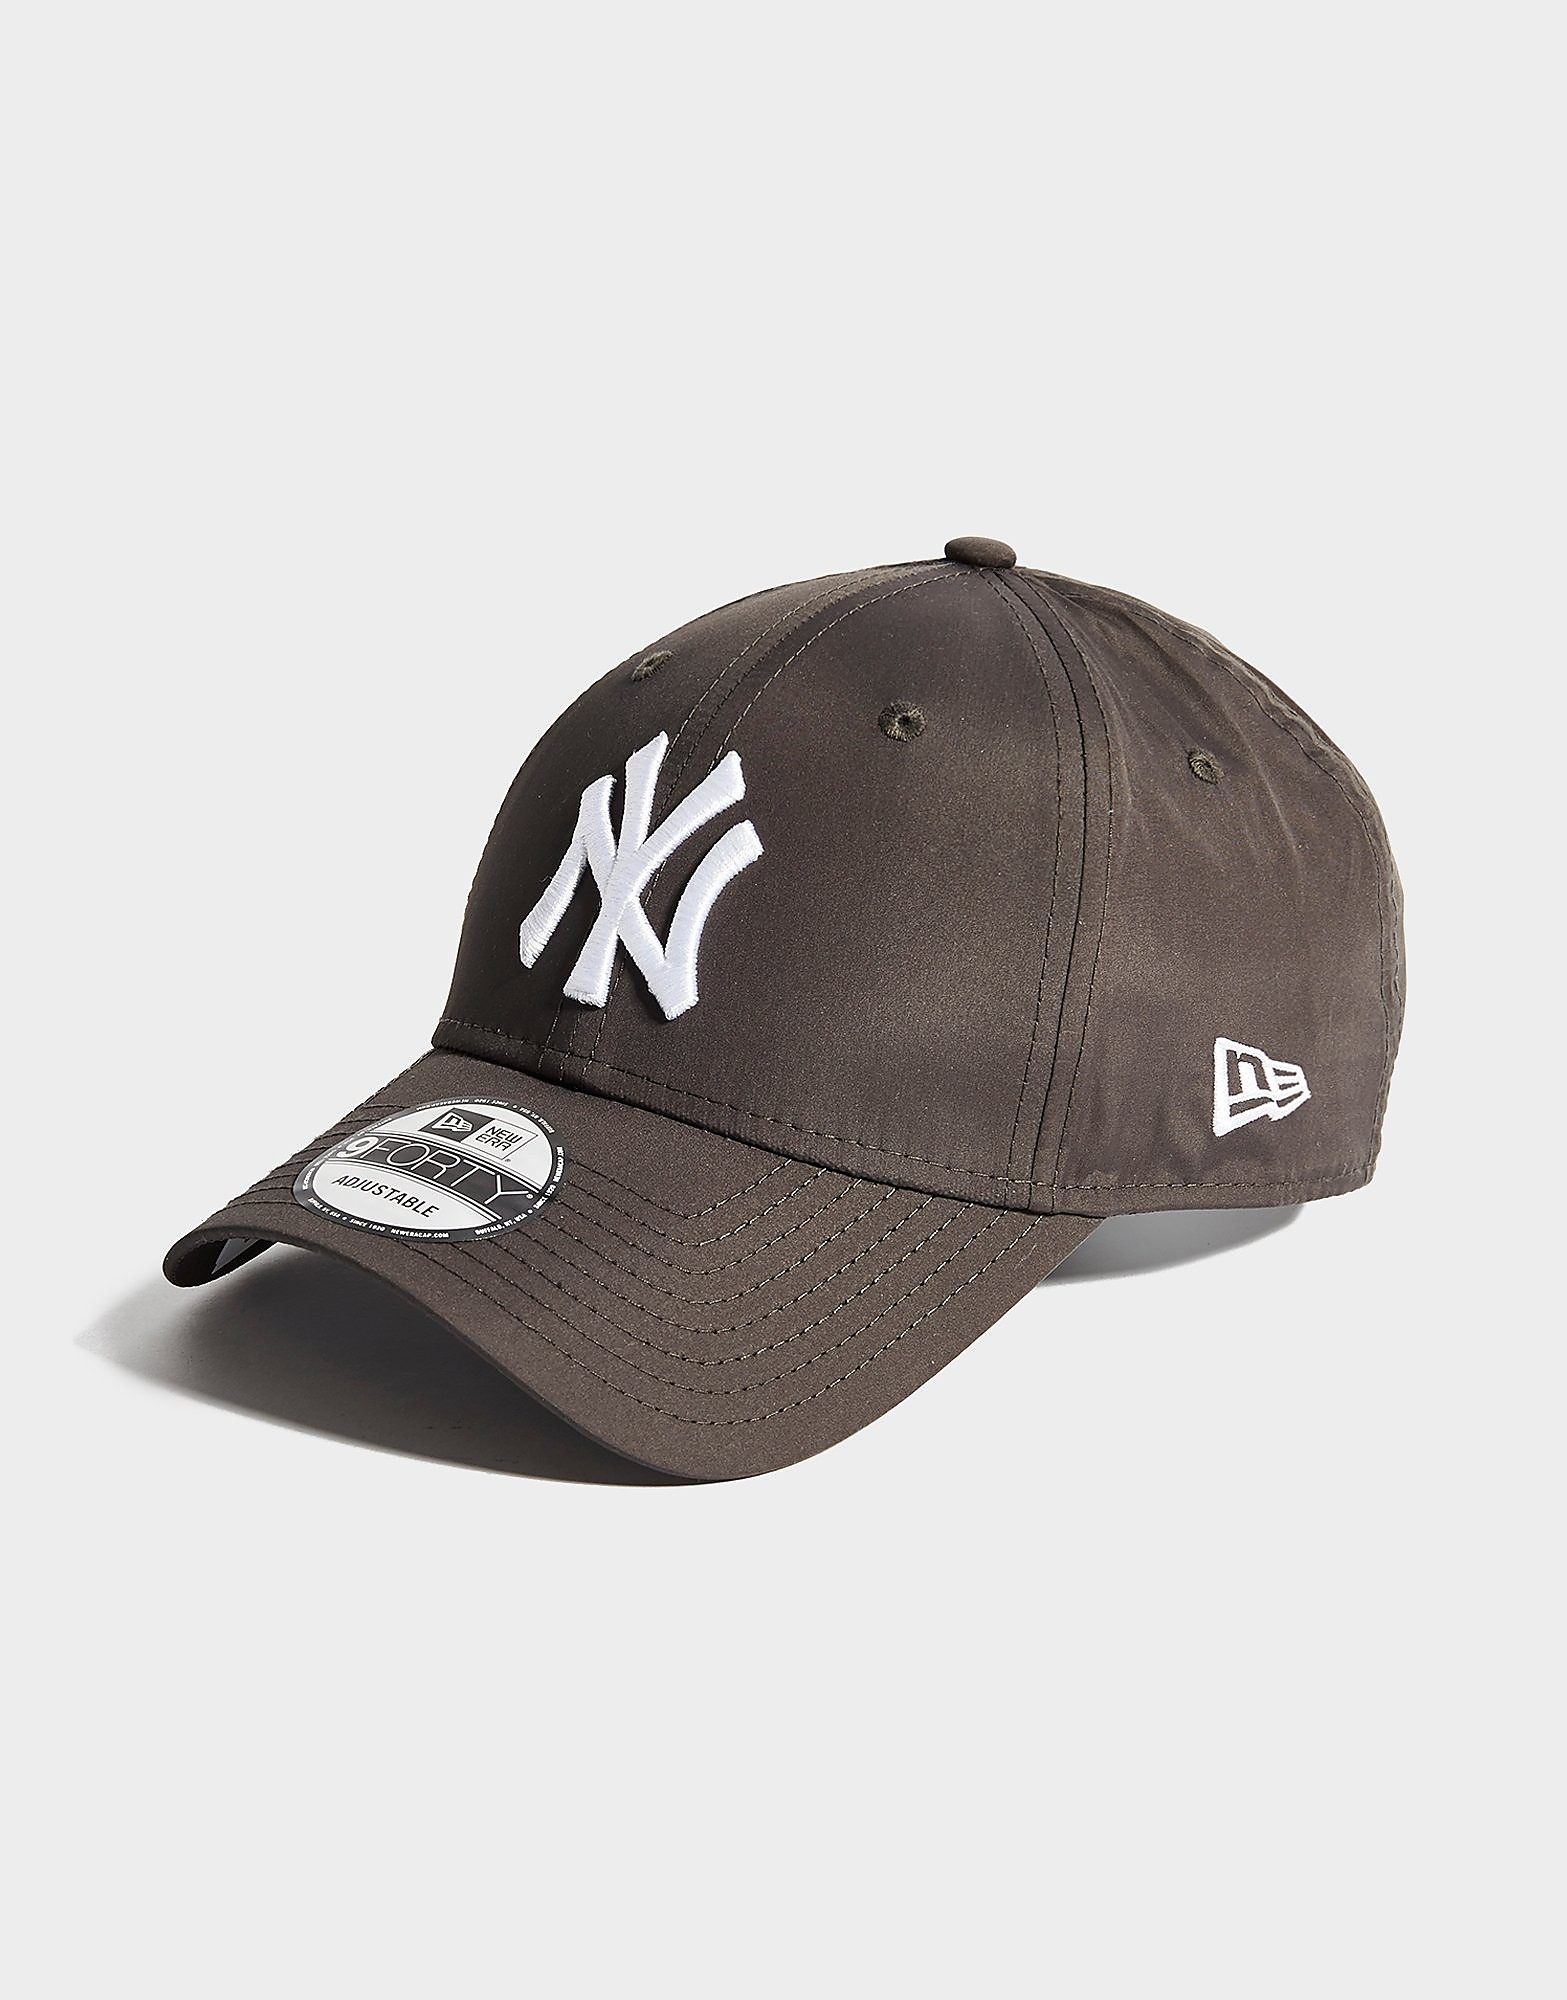 New Era MLB New York Yankees 9FORTY Cap - Grijs - Heren